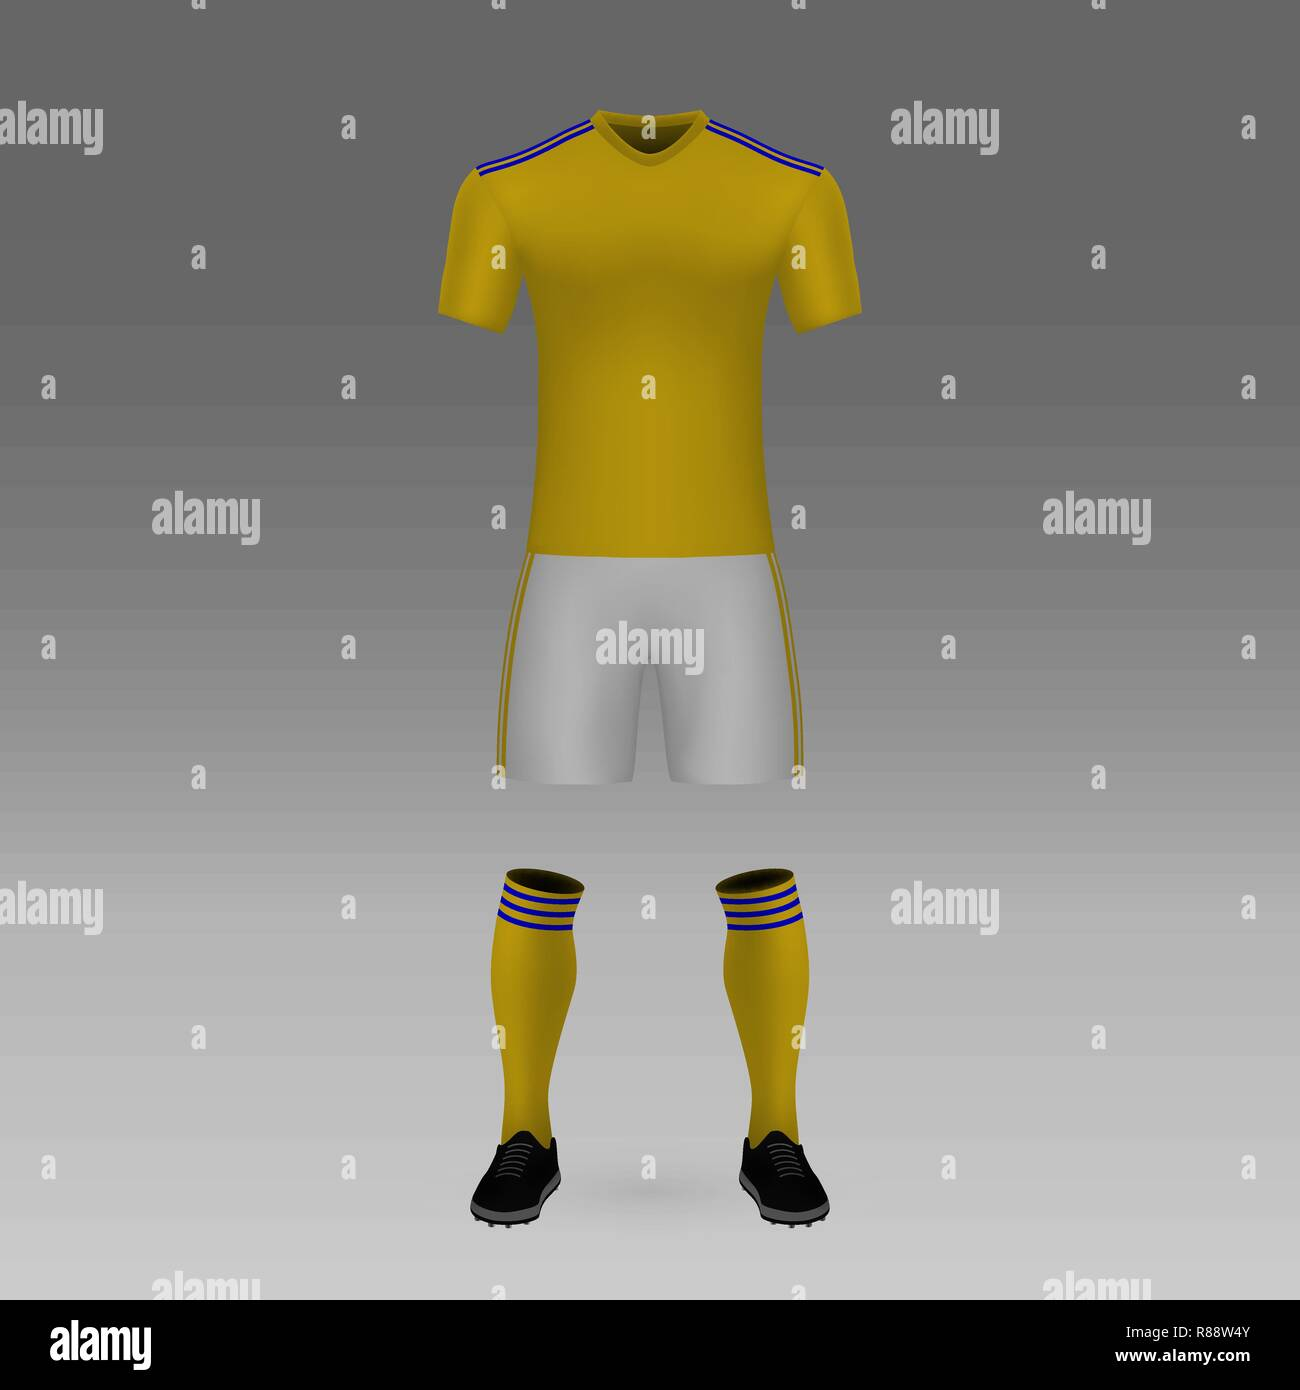 Football Kit UANL Tigres Shirt Template For Soccer Jersey Vector Illustration